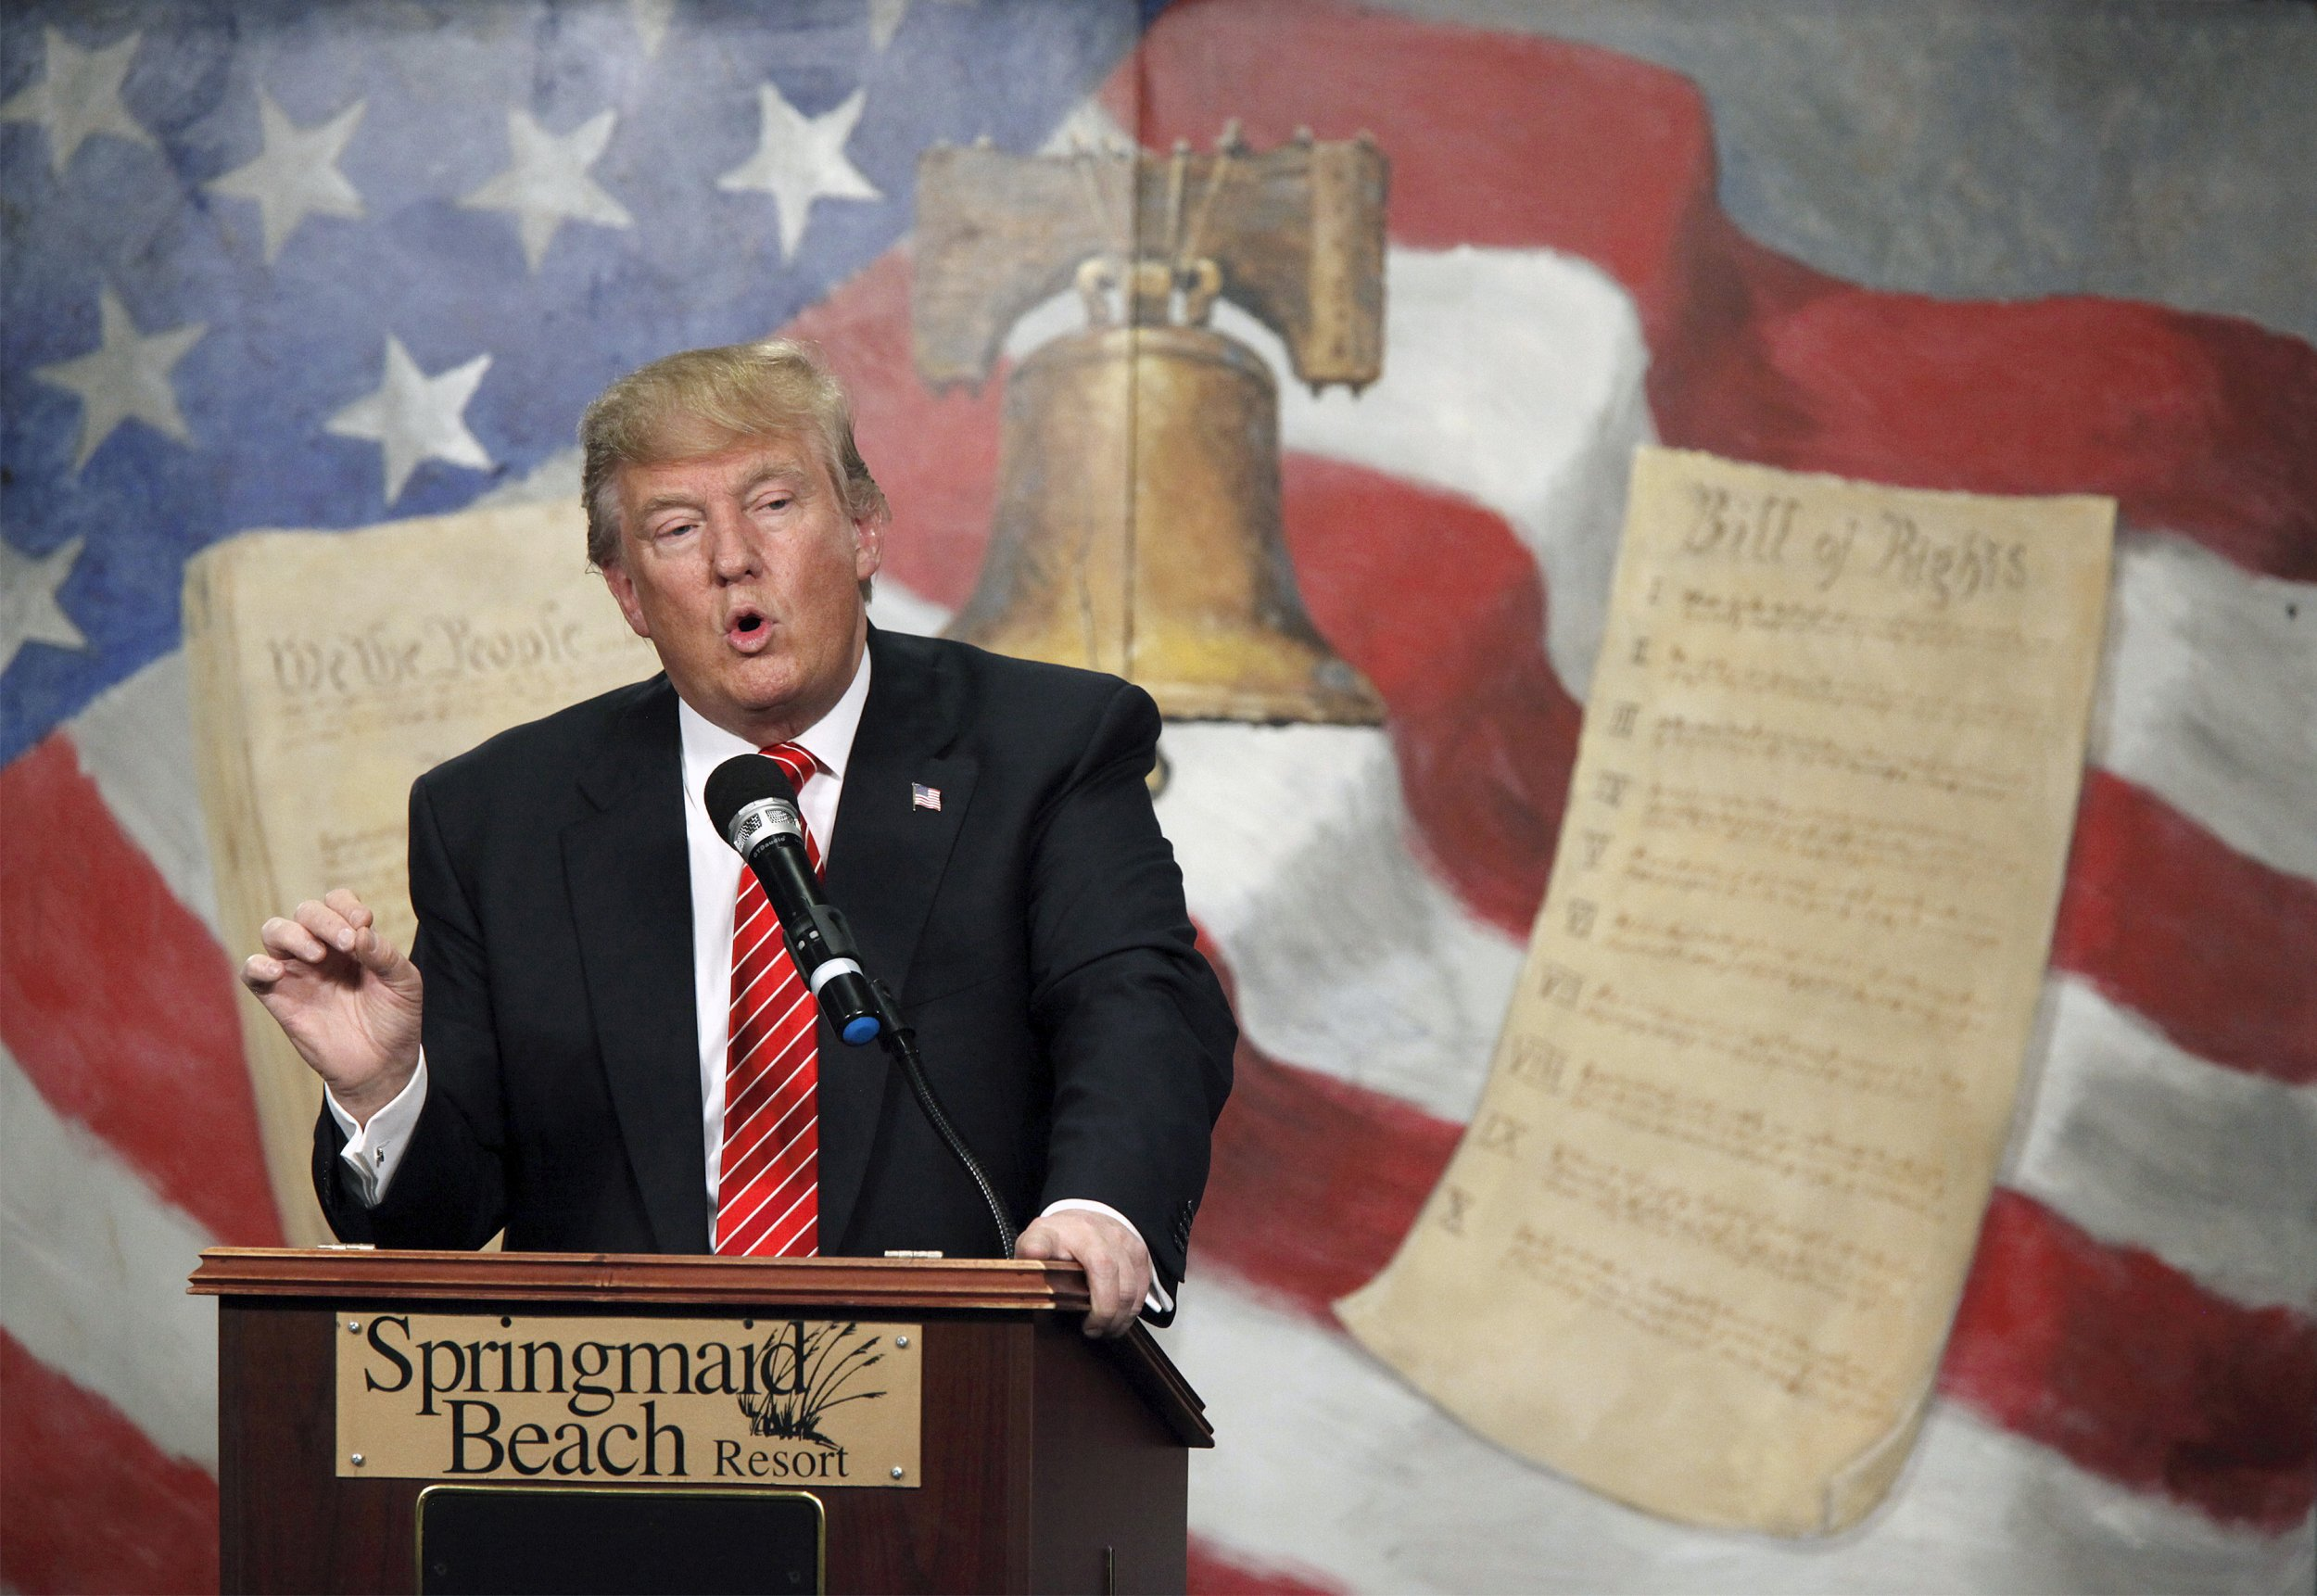 06_11_Trump_Populist_01